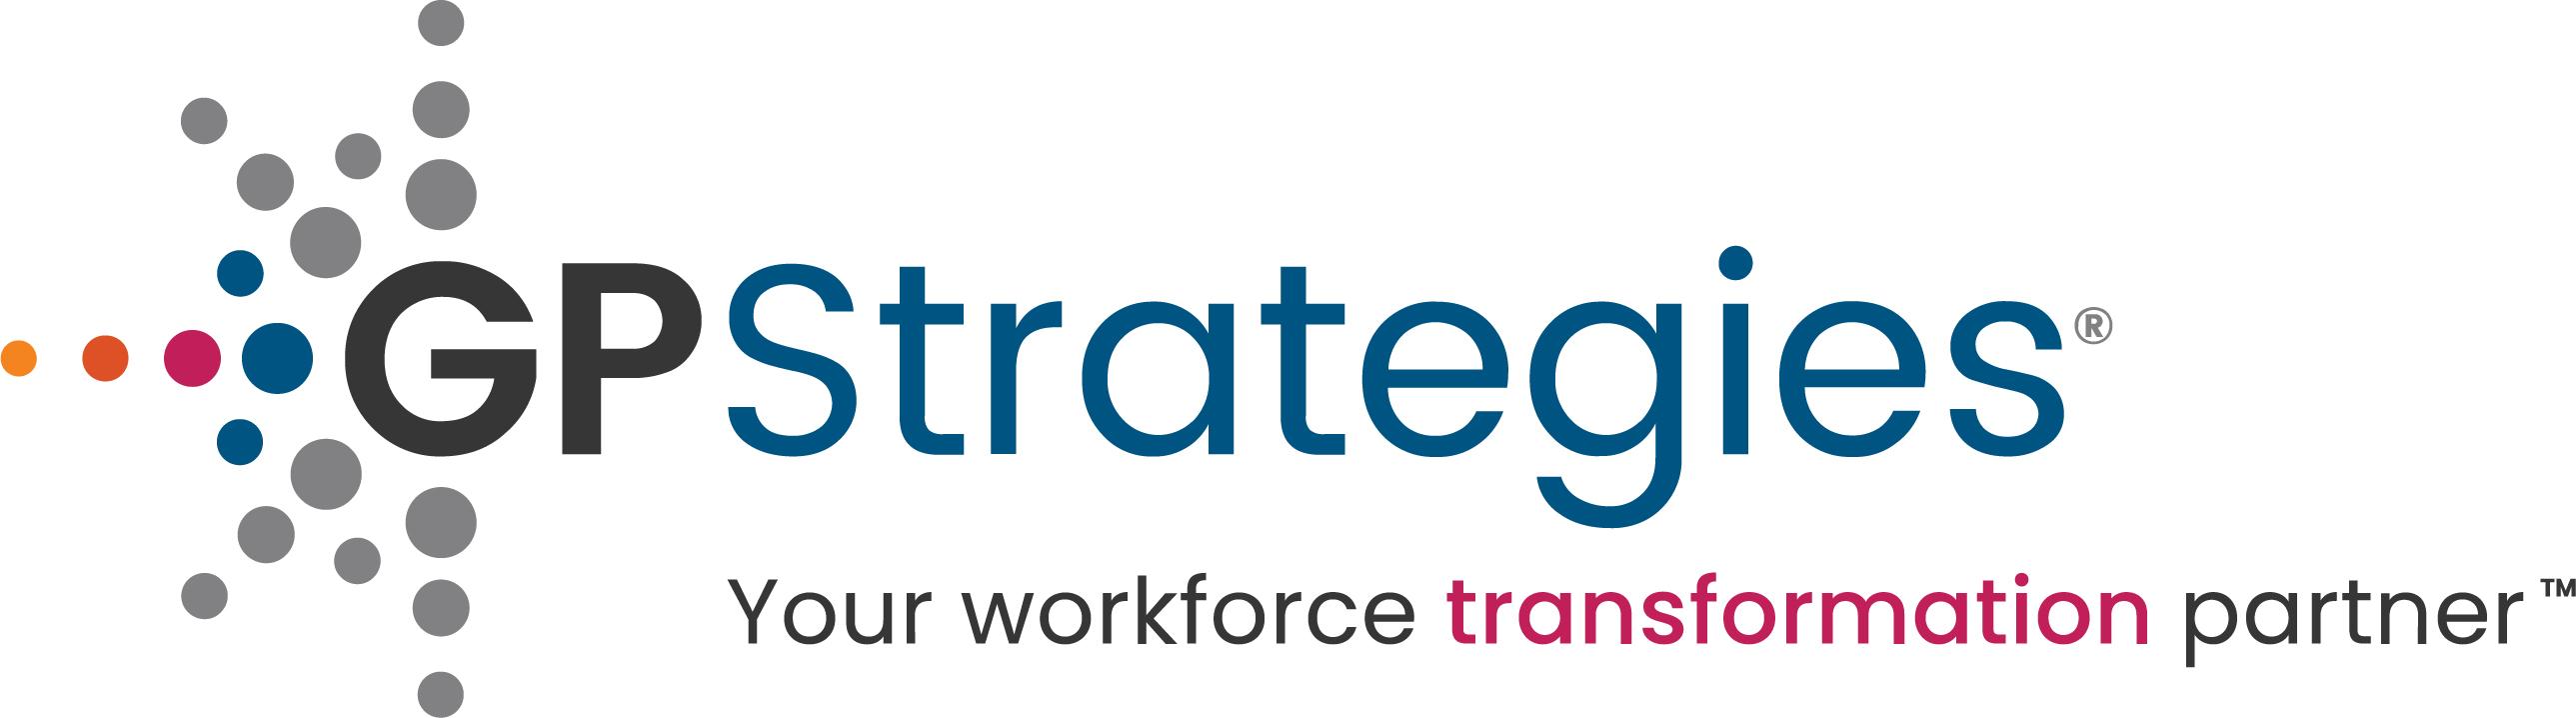 GP Strategies Logo Tagline 2020 RGB BerryTrans highRes